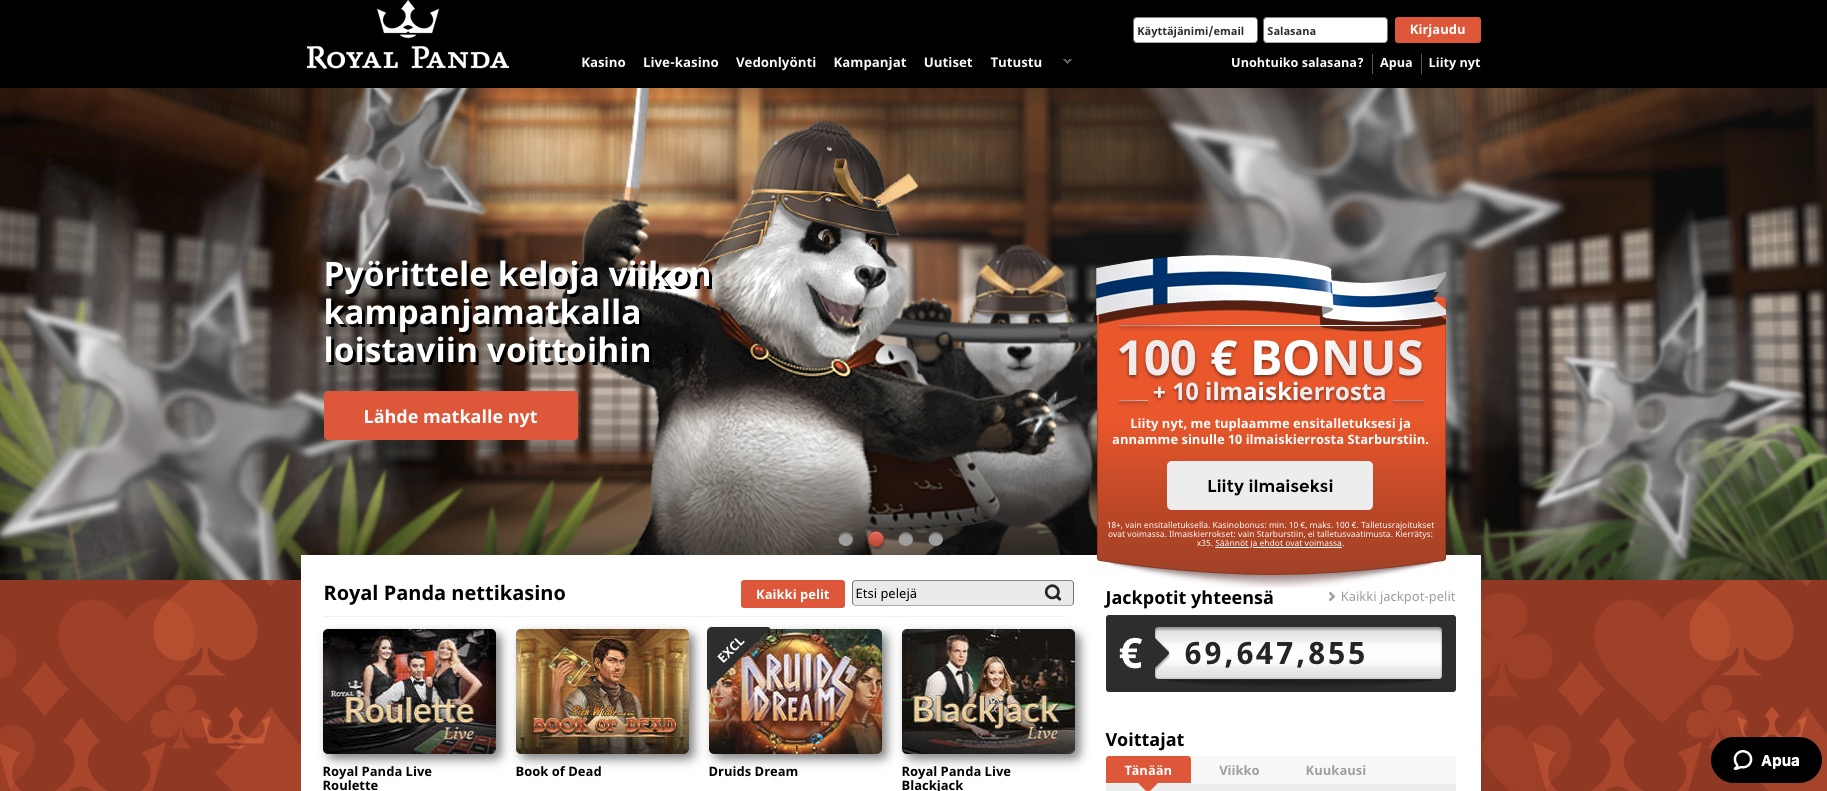 Royal Panda kolikkopelit